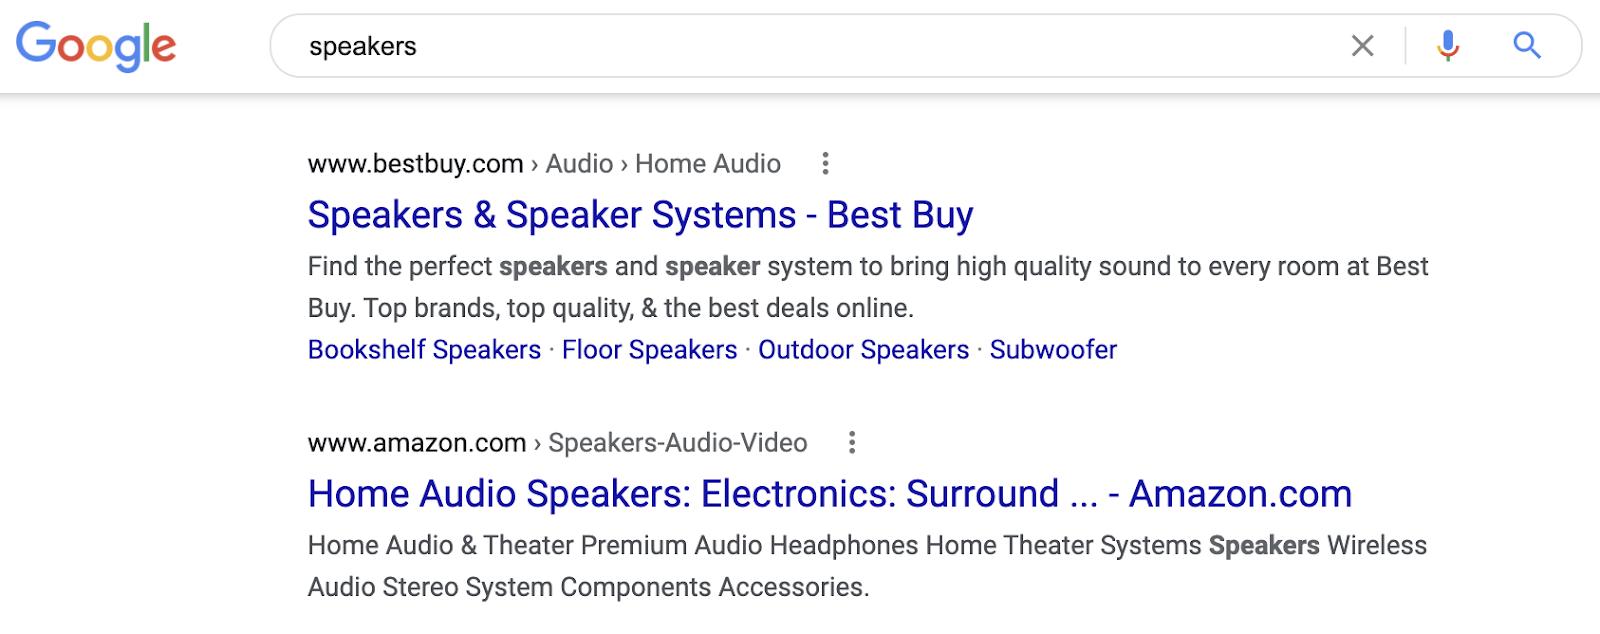 14 speakers